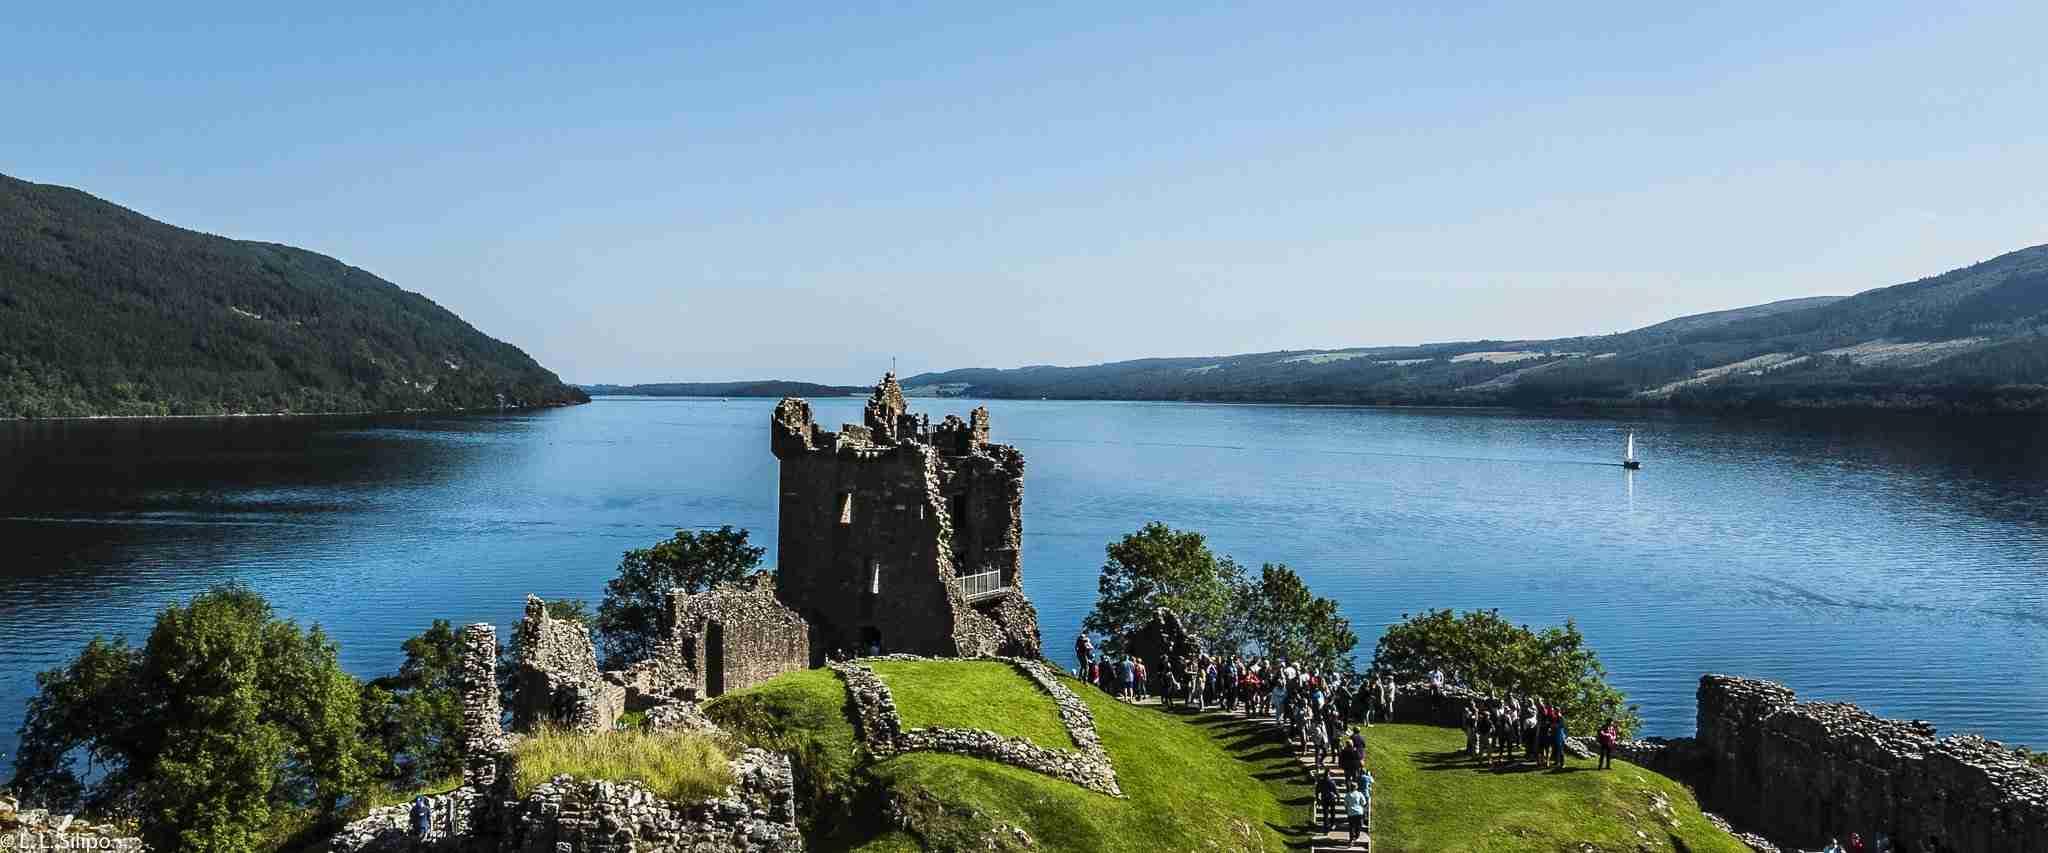 architecture, background, britain, building, castle, europe, famous, highlands, historic, history, holiday, lake, landmark, landscape, loch, ness, old, scotland, scottish, sky, summer, tourism, travel, uk, urquhart